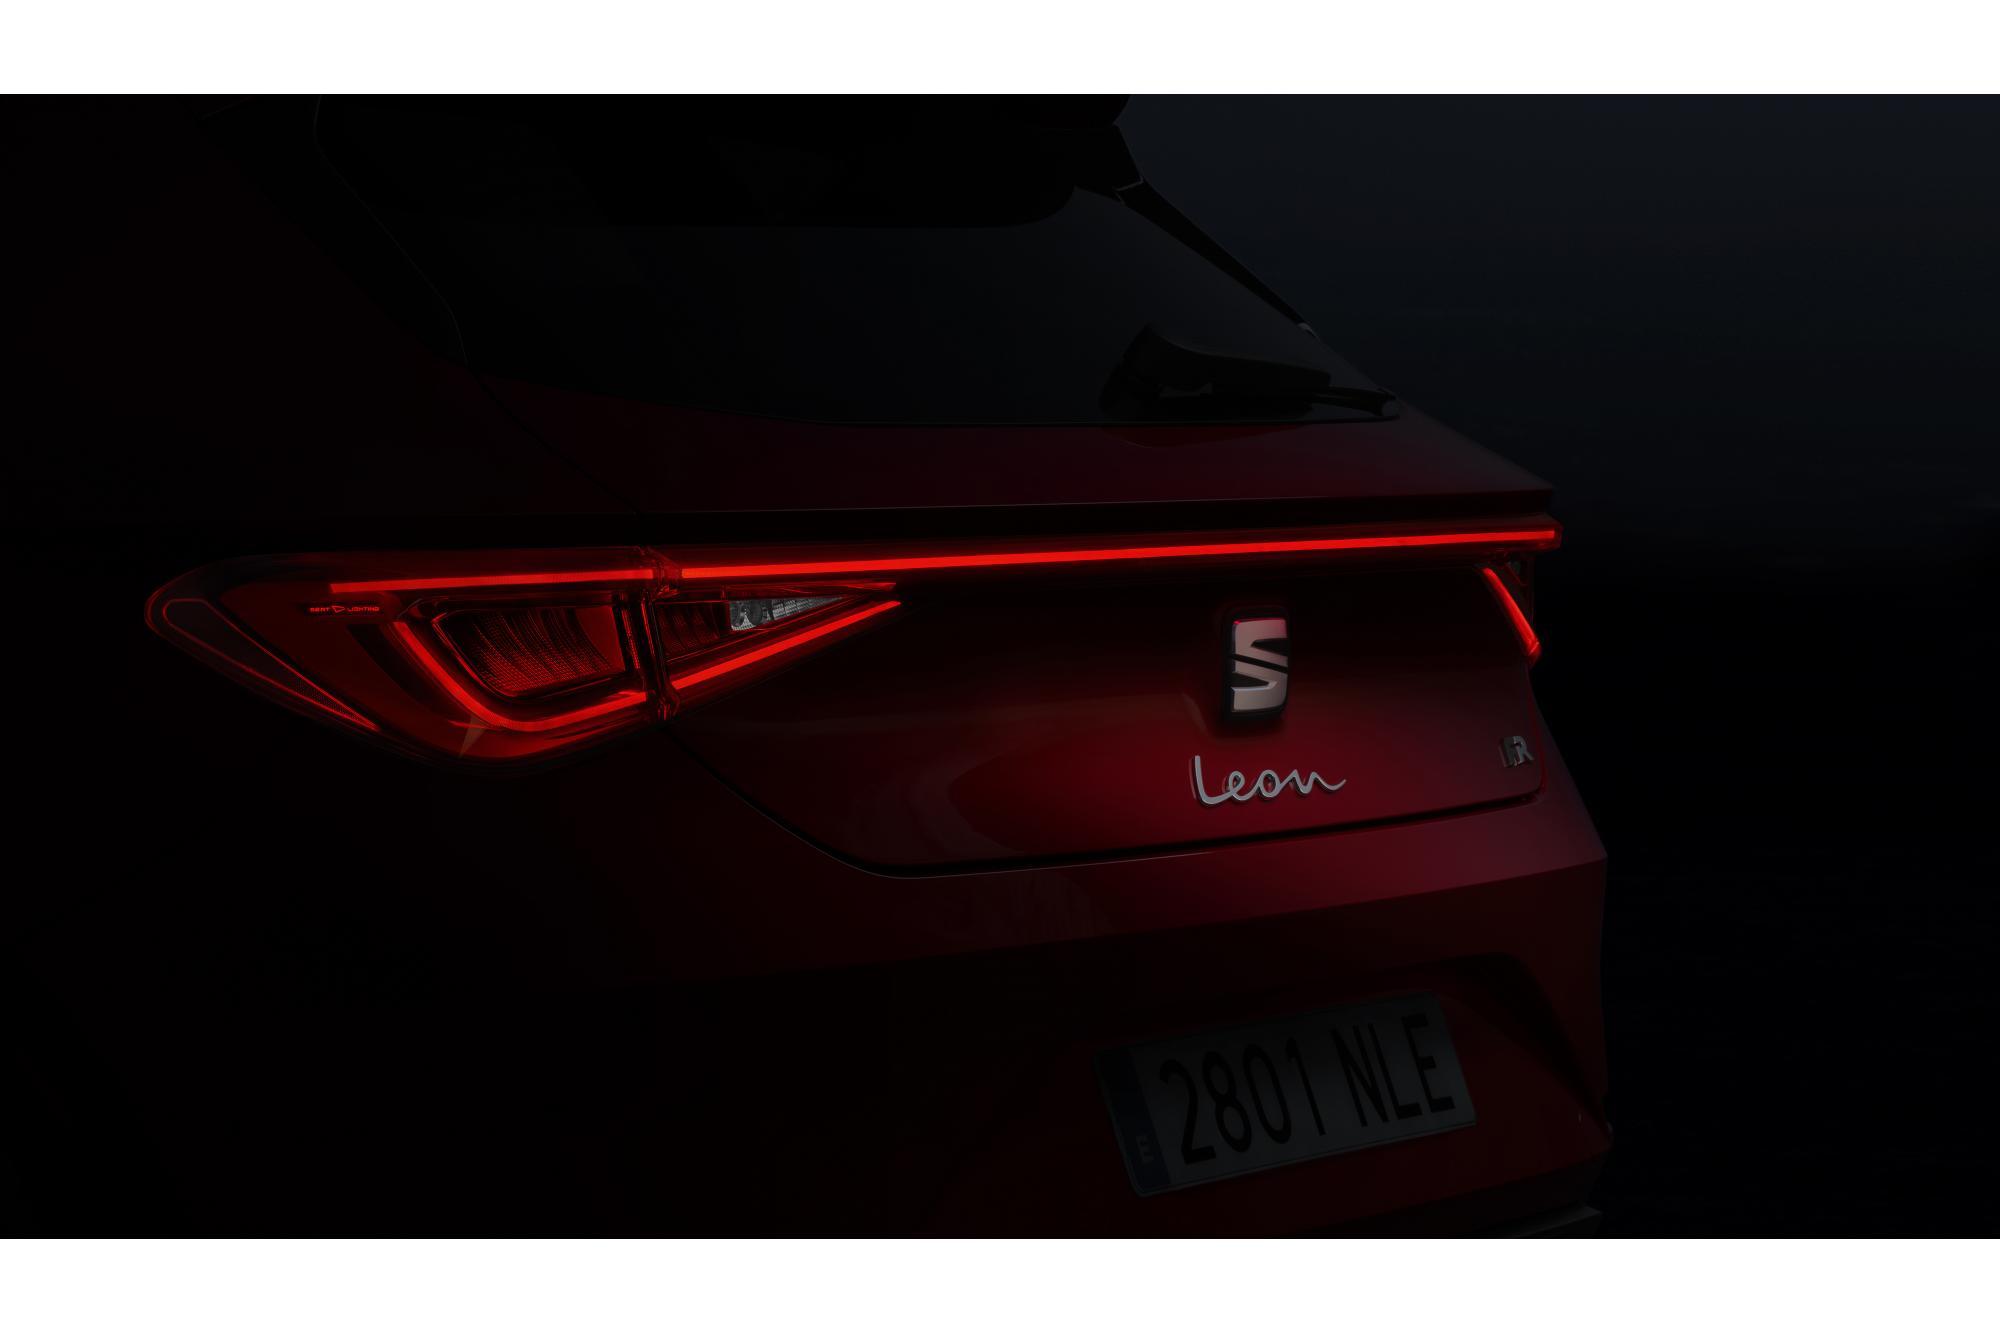 H δυνατή παρουσία του νέου SEAT Leon στην compact κατηγορία